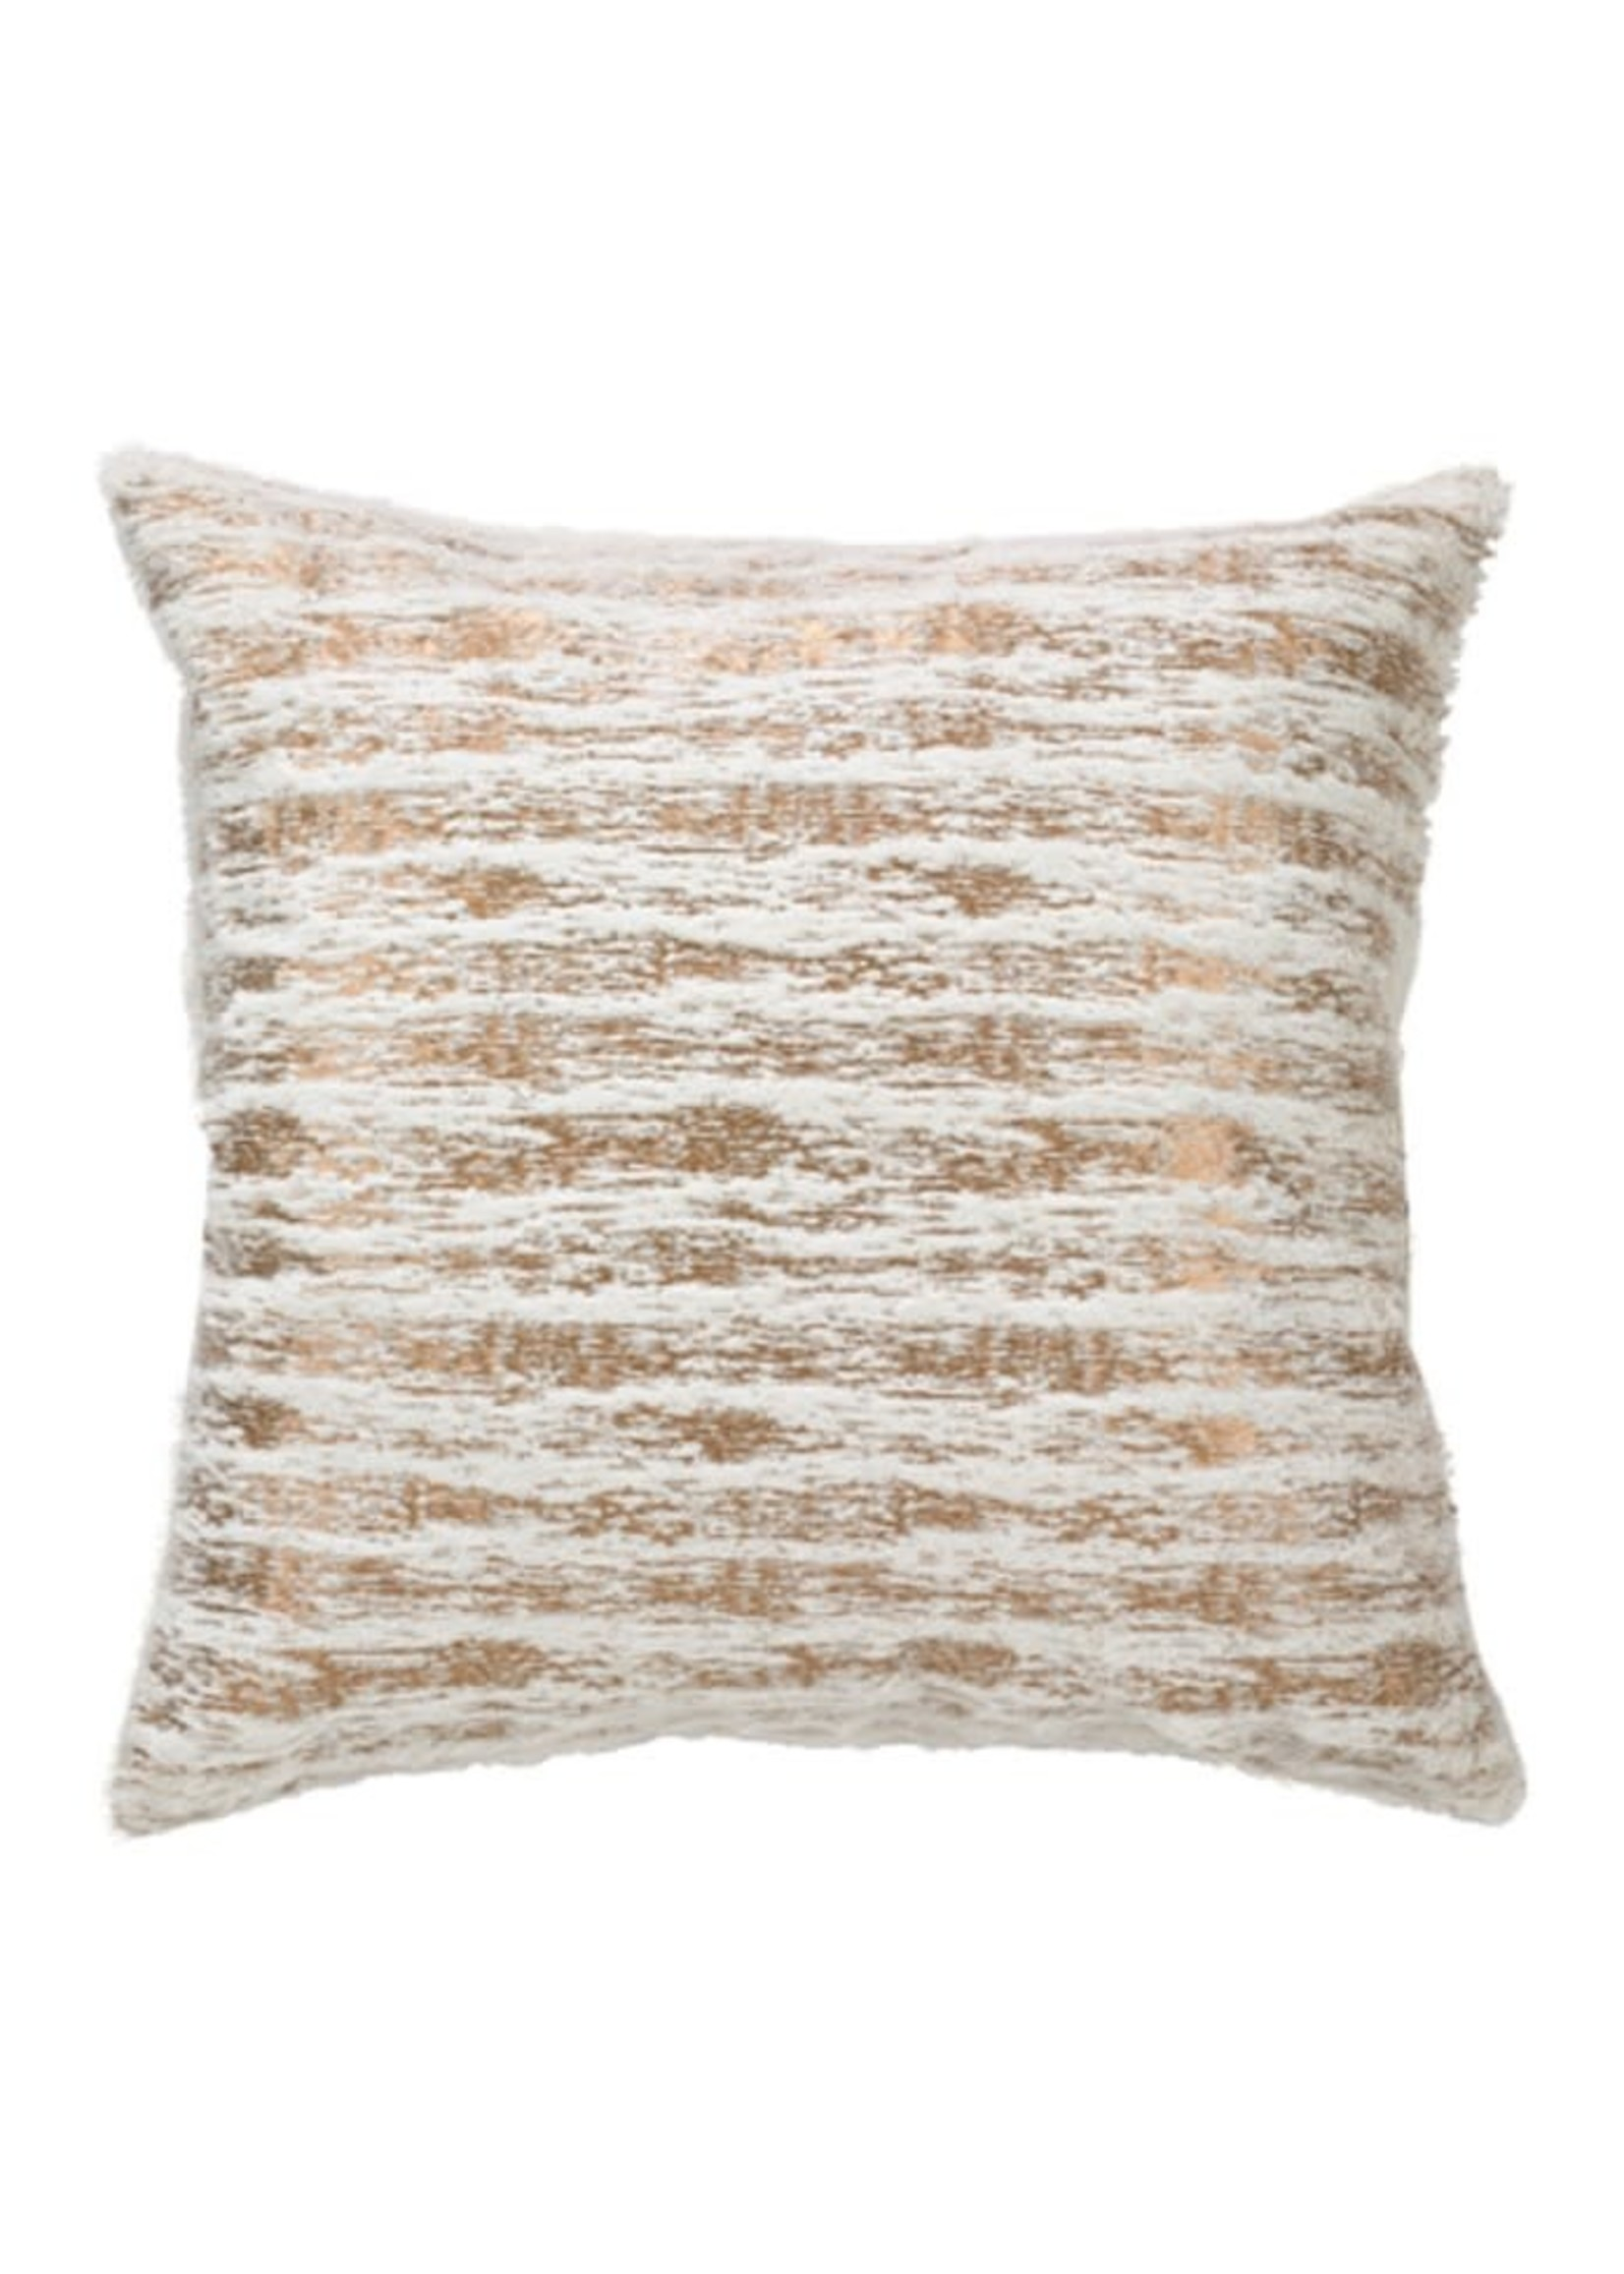 Saro SARO Foil Print Faux Fur Pillow Down Filled - Gold